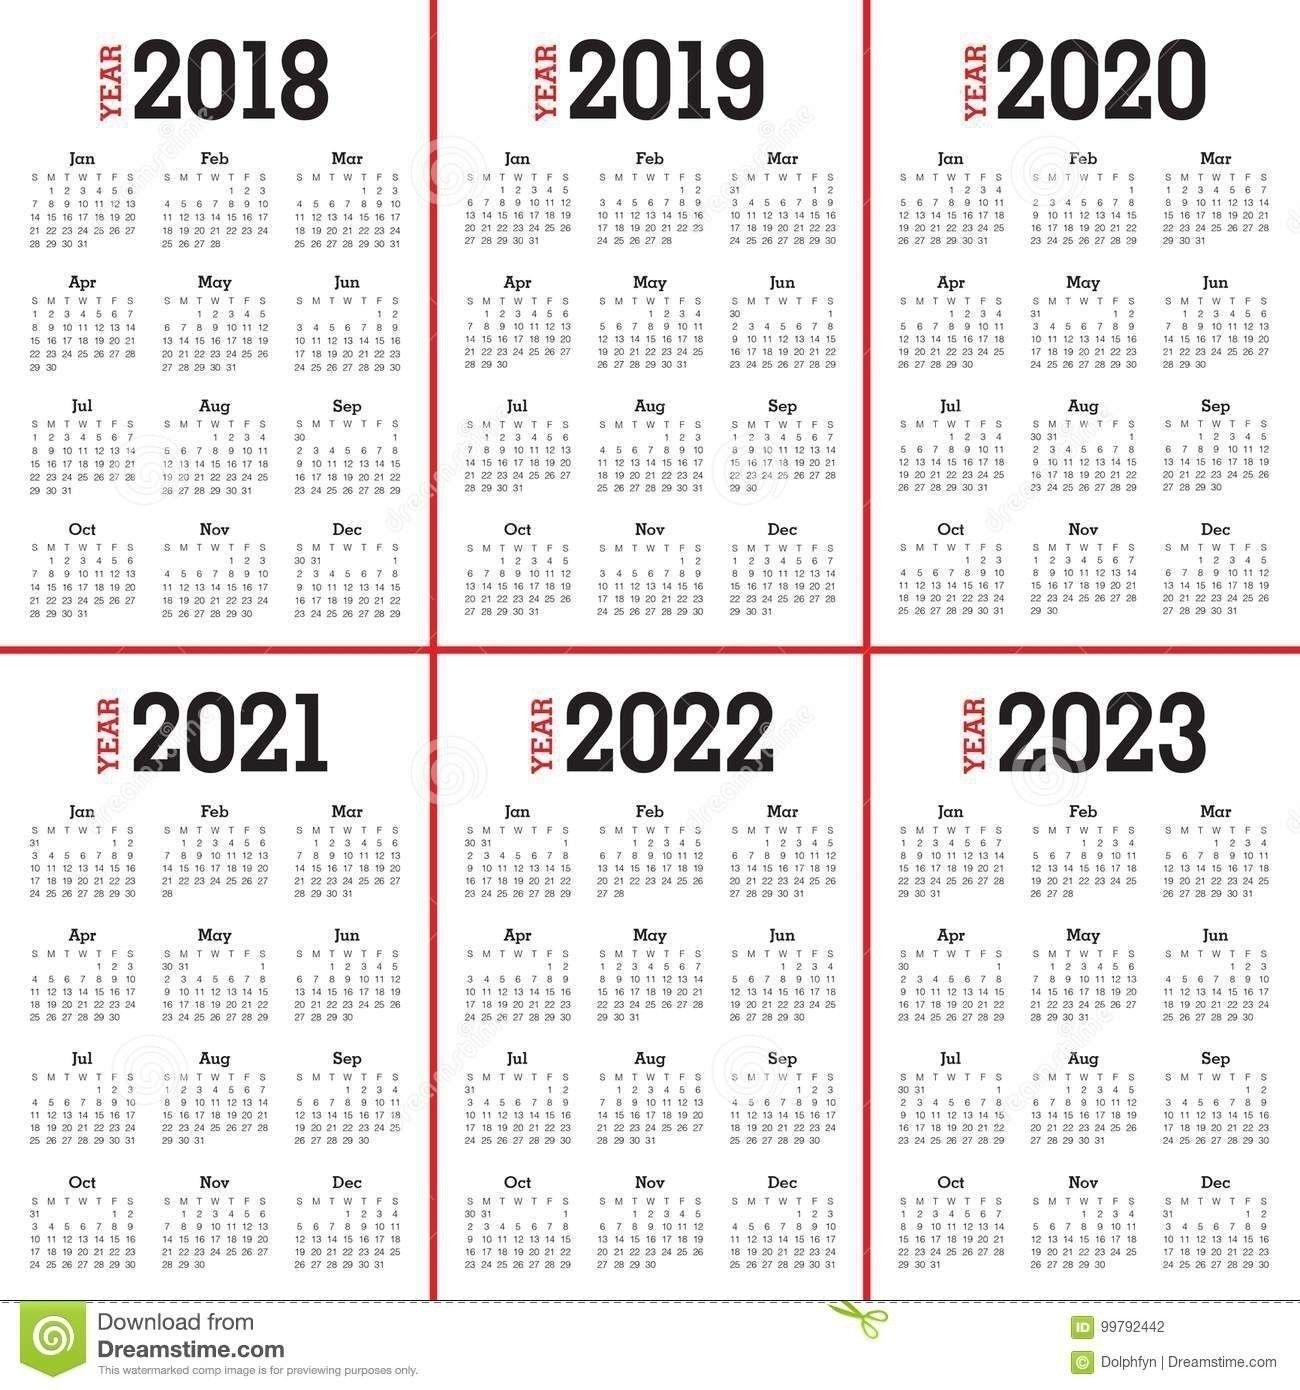 3 Year Calendar 2021 To 2023 | Stiker